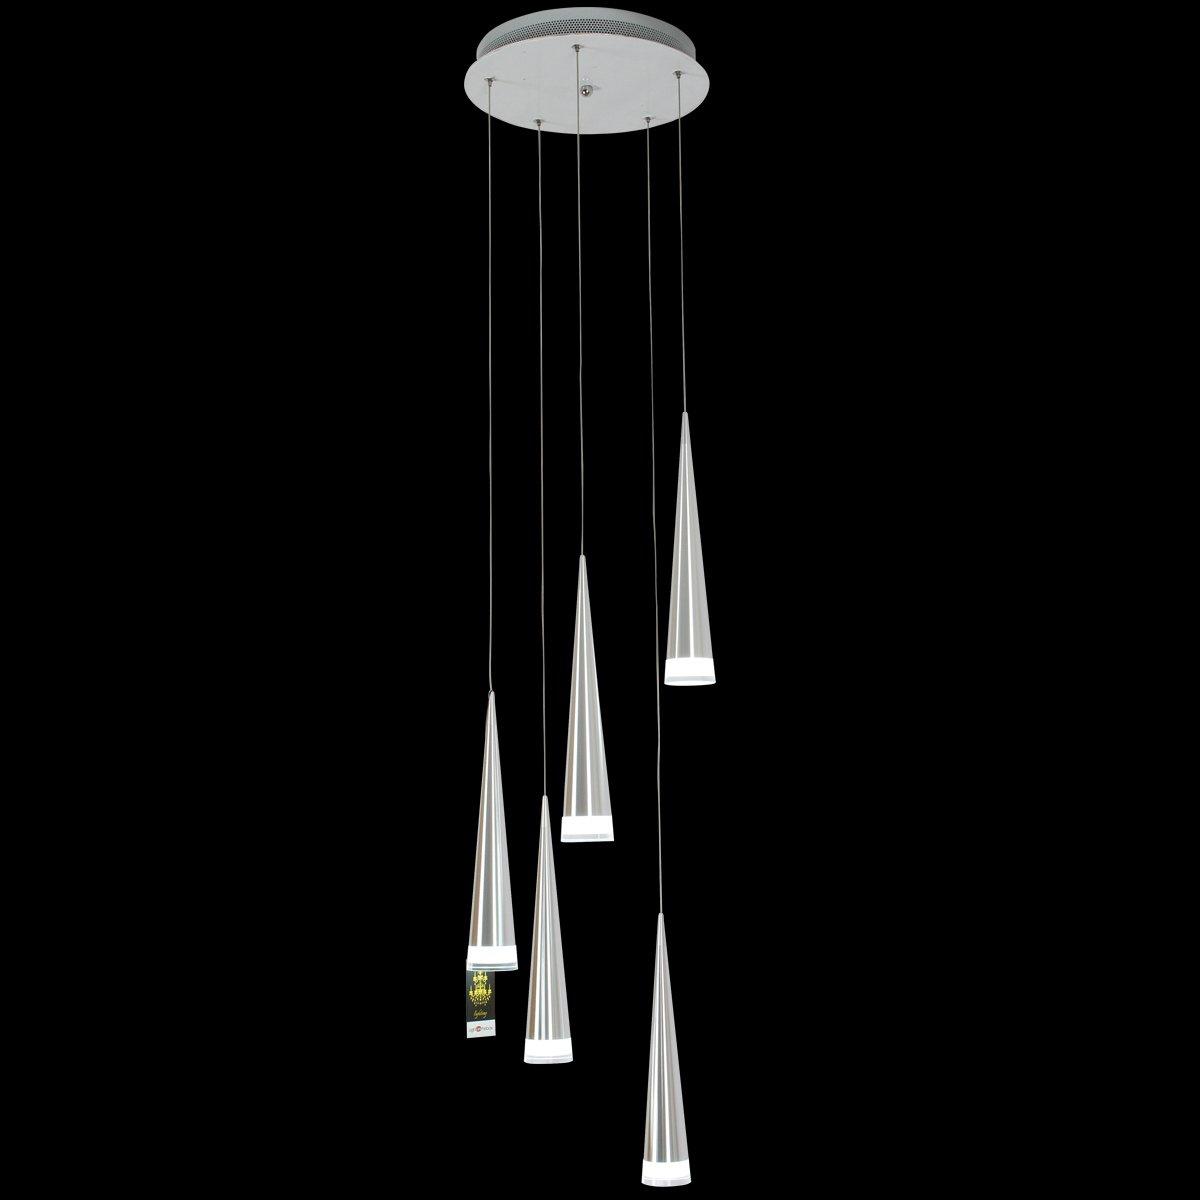 1731270 White Dining Room//Kitchen Bulb Included 110-240V LightInTheBox Max 5W 3 Pendant Light Modern Chrome Acrylic Chandeliers Ceiling Lighting Fixture for LED Metal Living Room//Bedroom